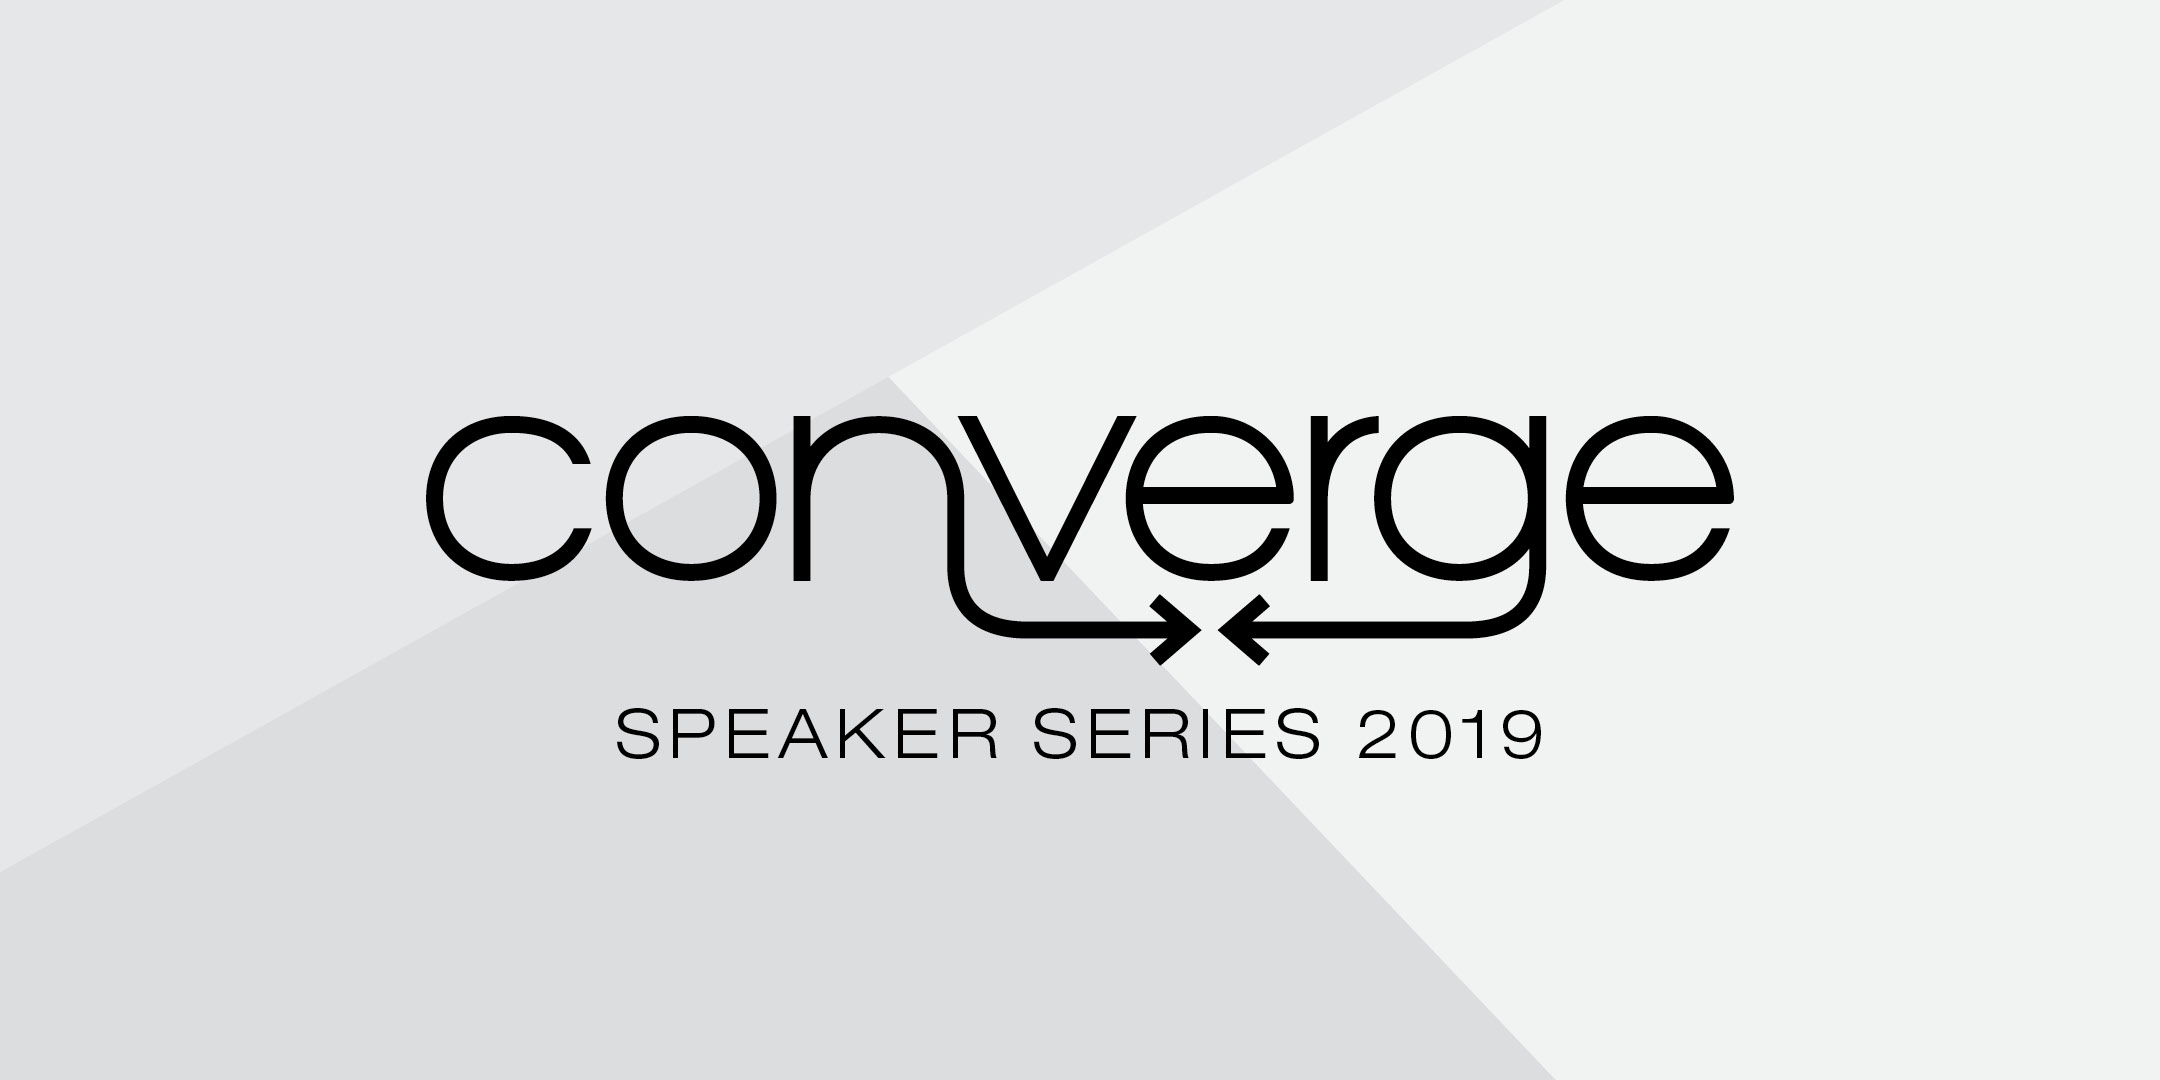 Converge_Speakers_Eventbrite_Header_2160x1080px.jpg